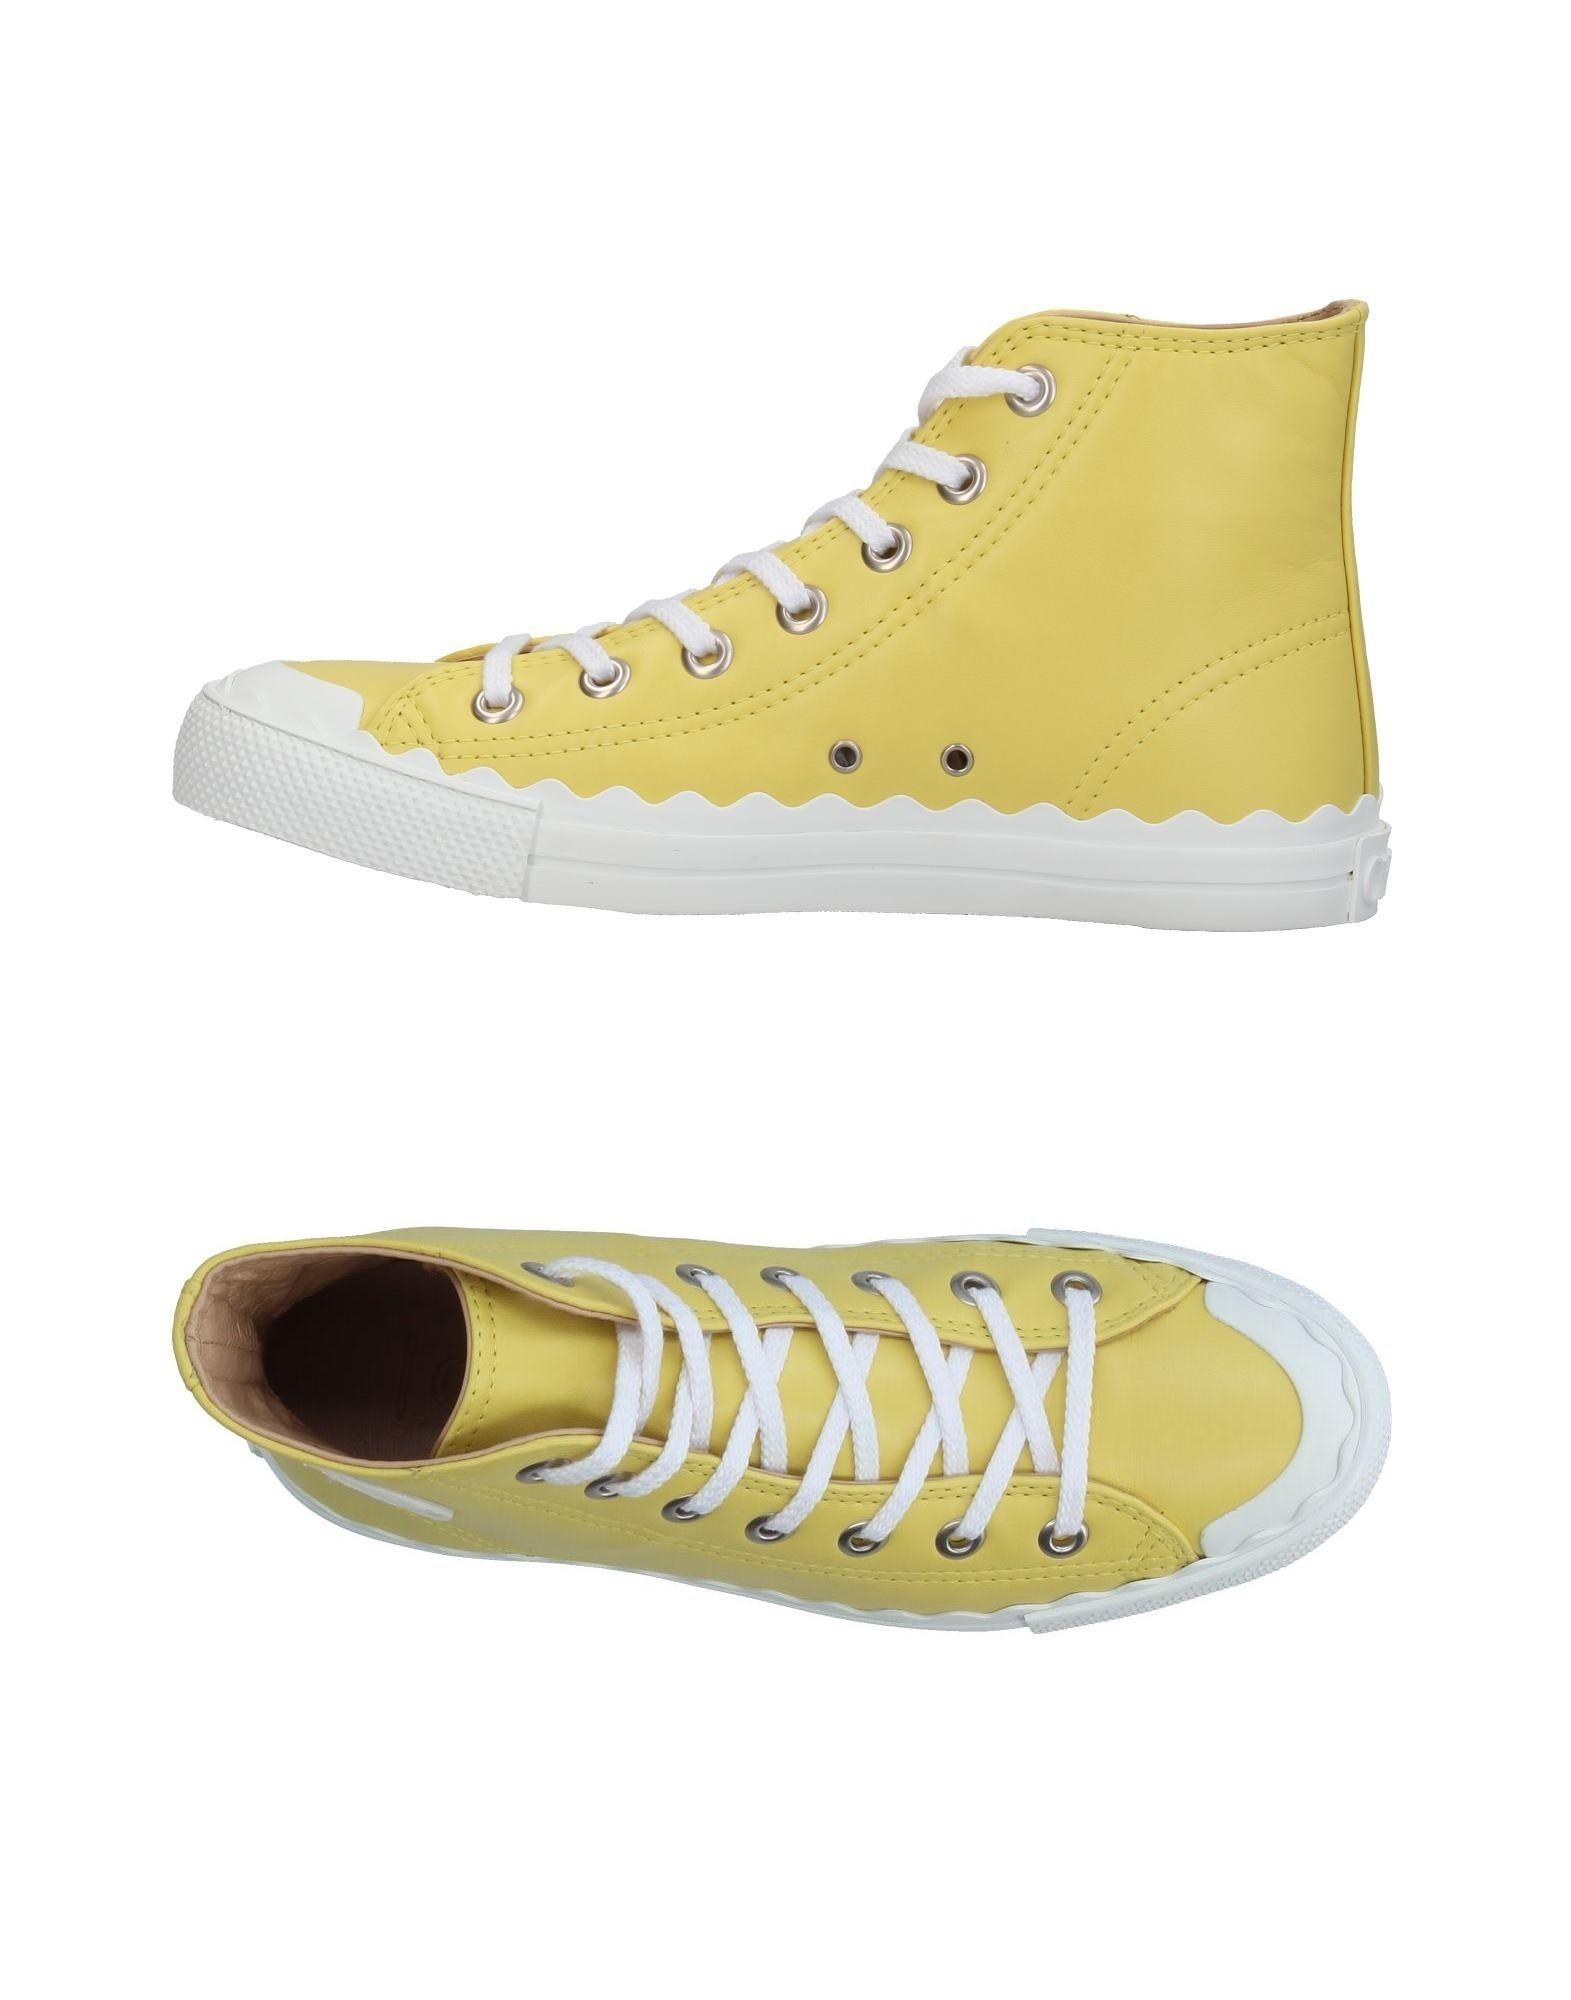 Chloé Sneakers Damen  11341161XMGut aussehende strapazierfähige Schuhe